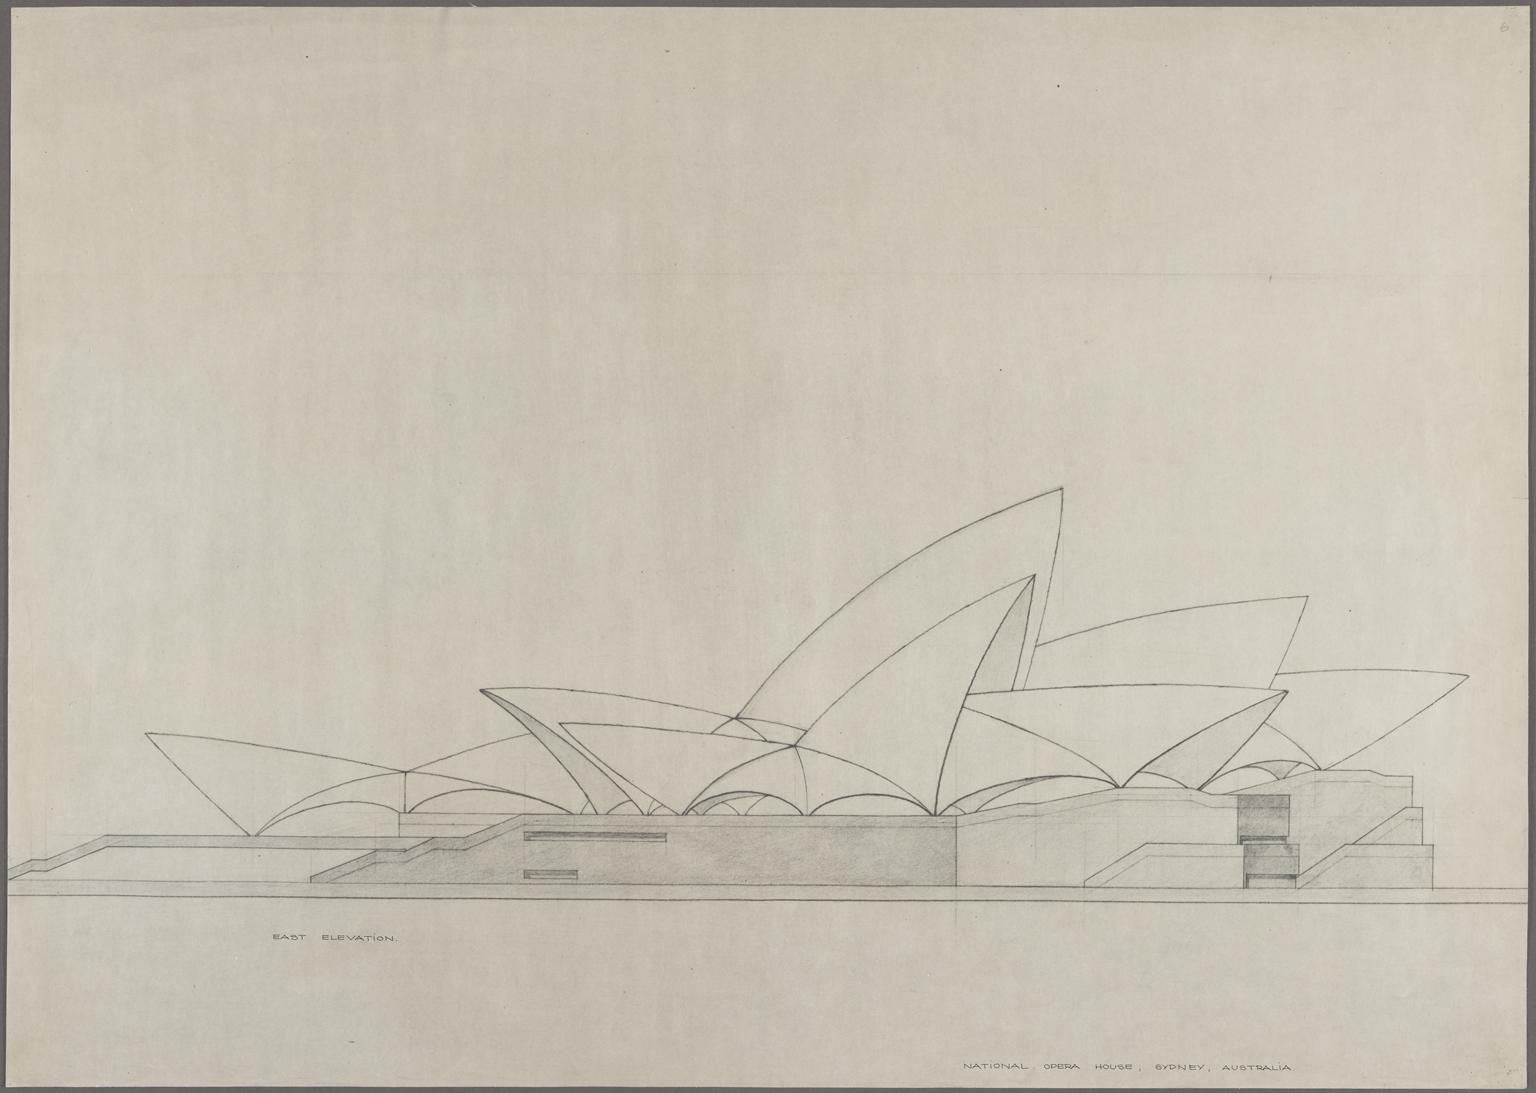 East elevation National Opera House, Sydney, Australia